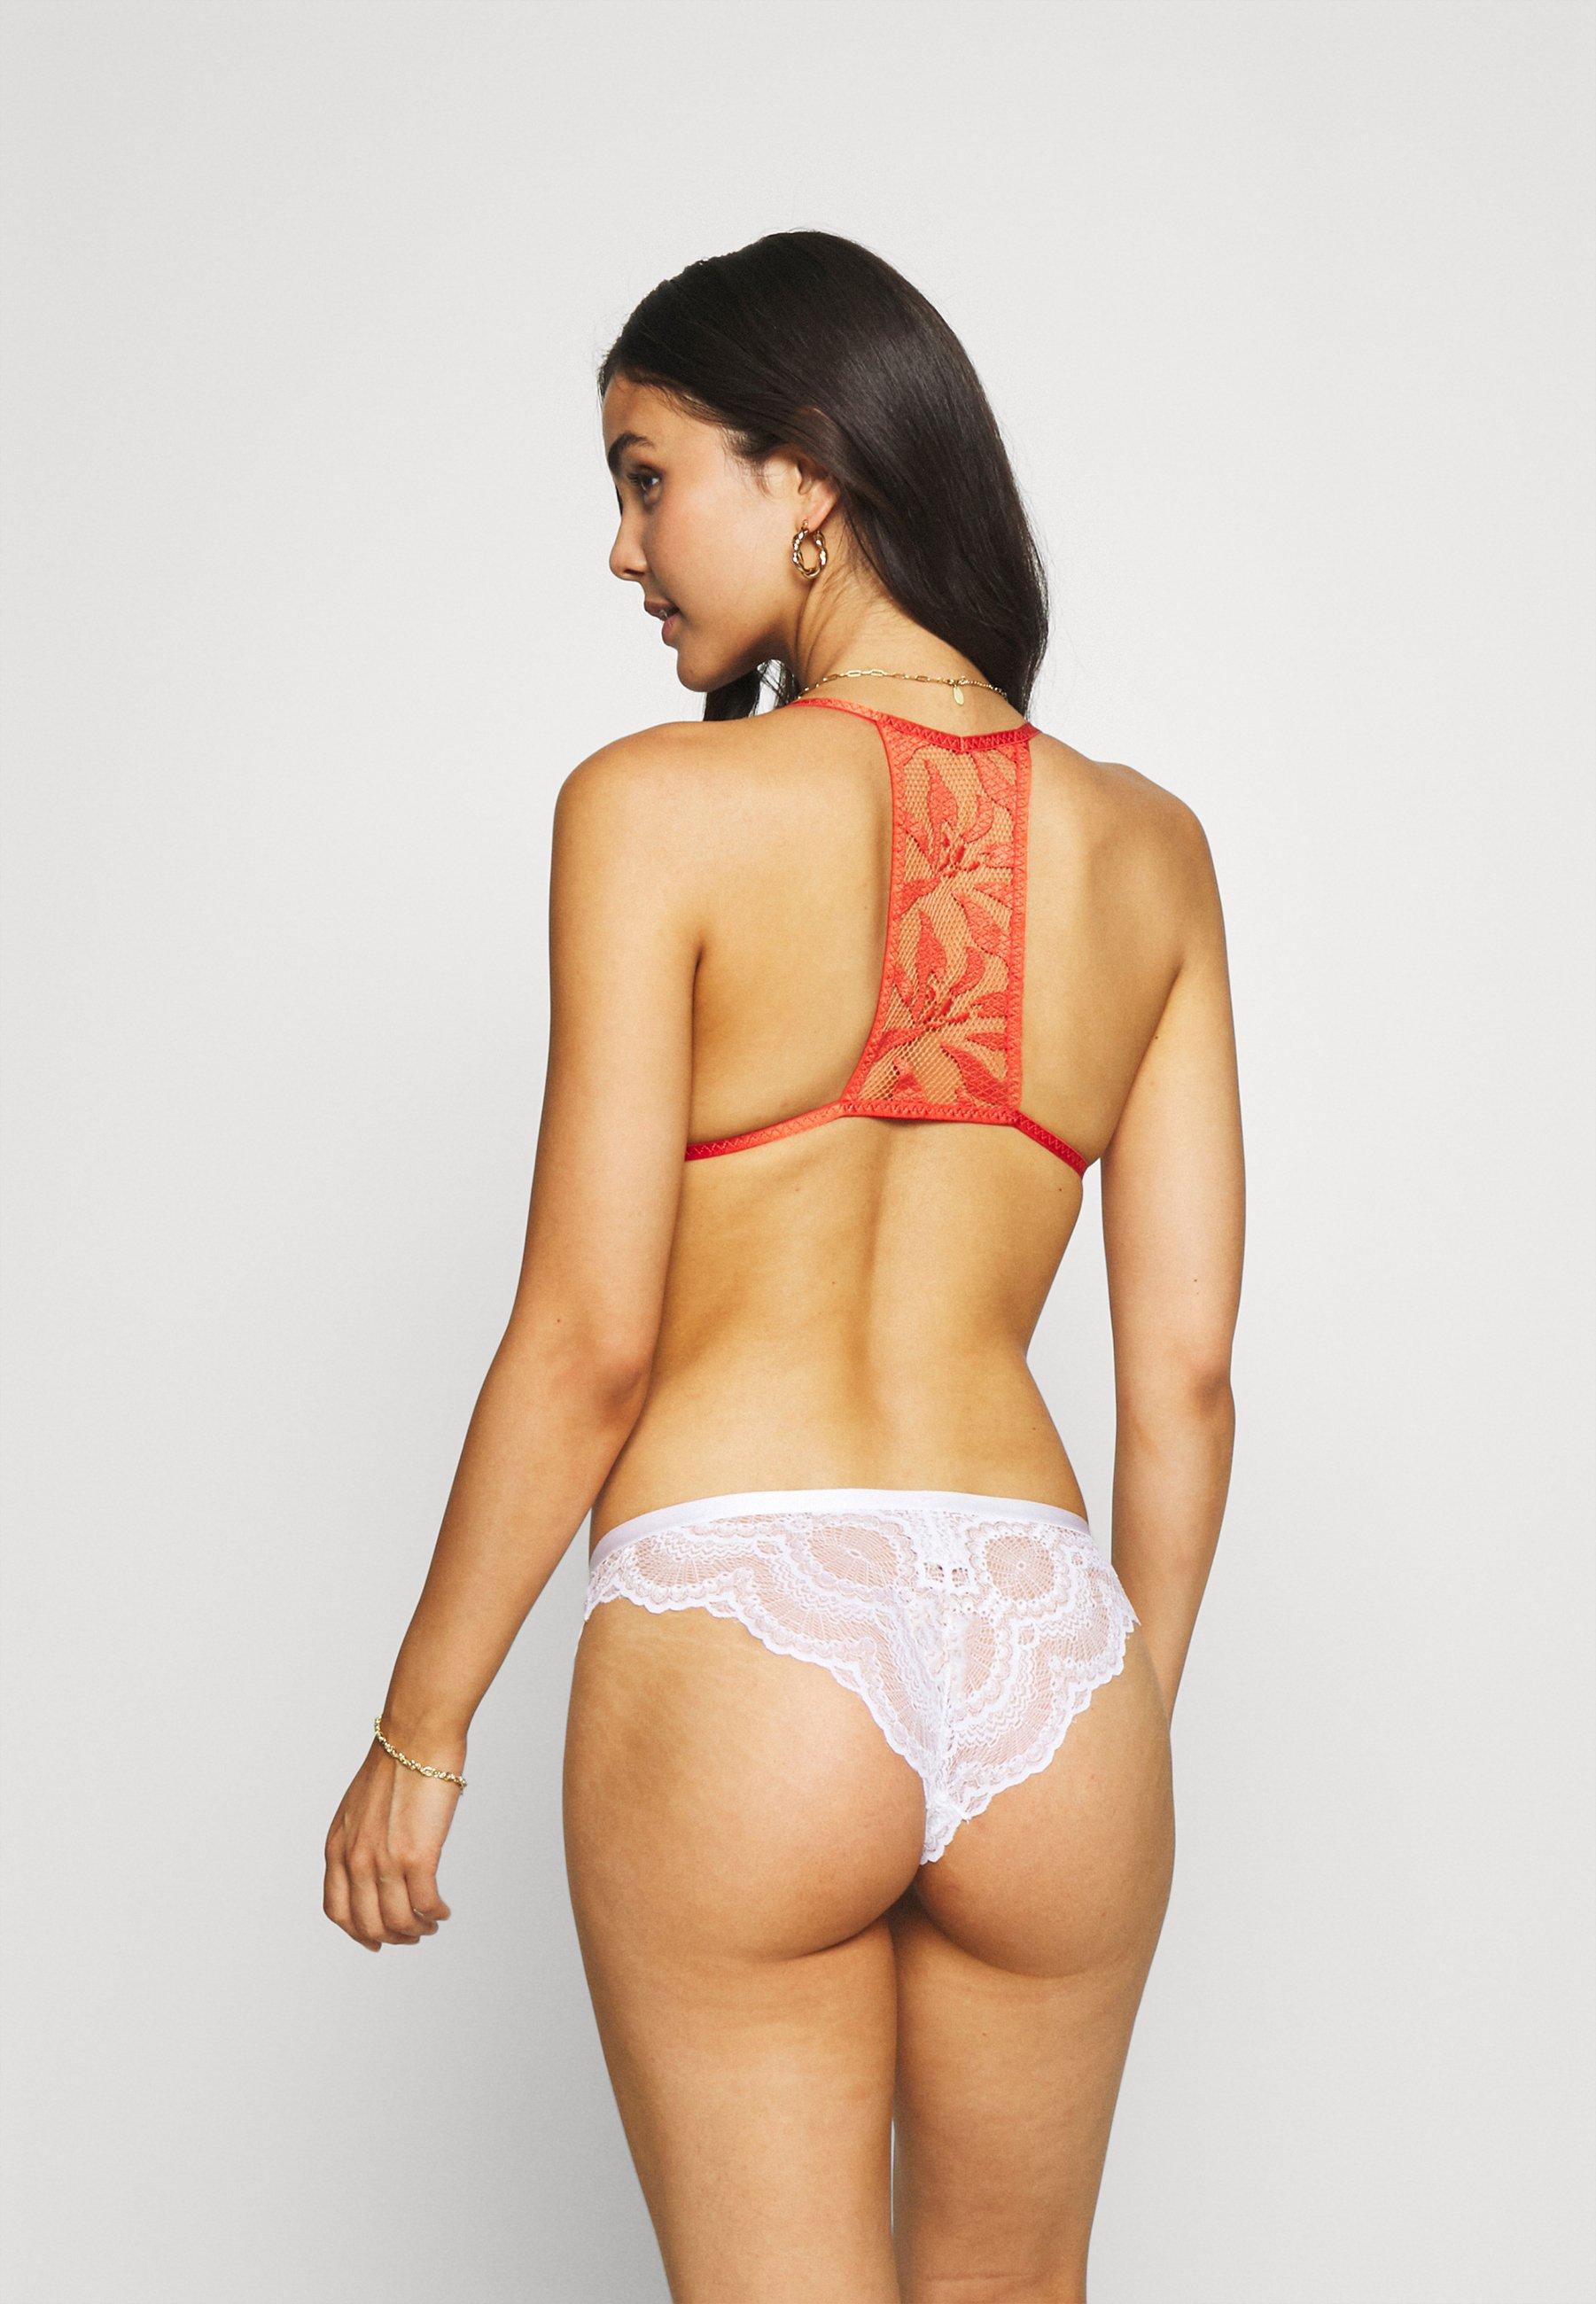 Women RAYA BRALETTE - Triangle bra